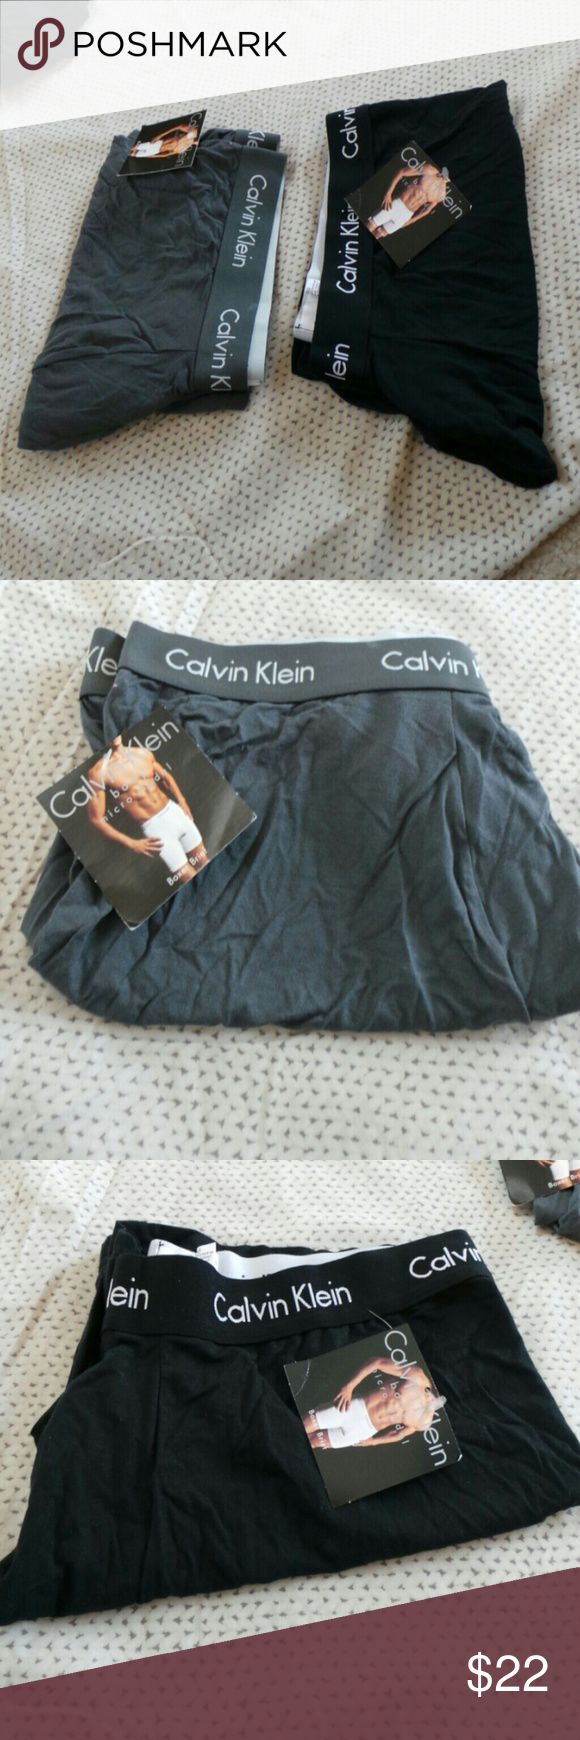 Calvin klein men's boxer briefs NWT men's boxer briefs.black one had three small stains as shown in pic. 2 for one price. Calvin Klein Underwear & Socks Boxer Briefs